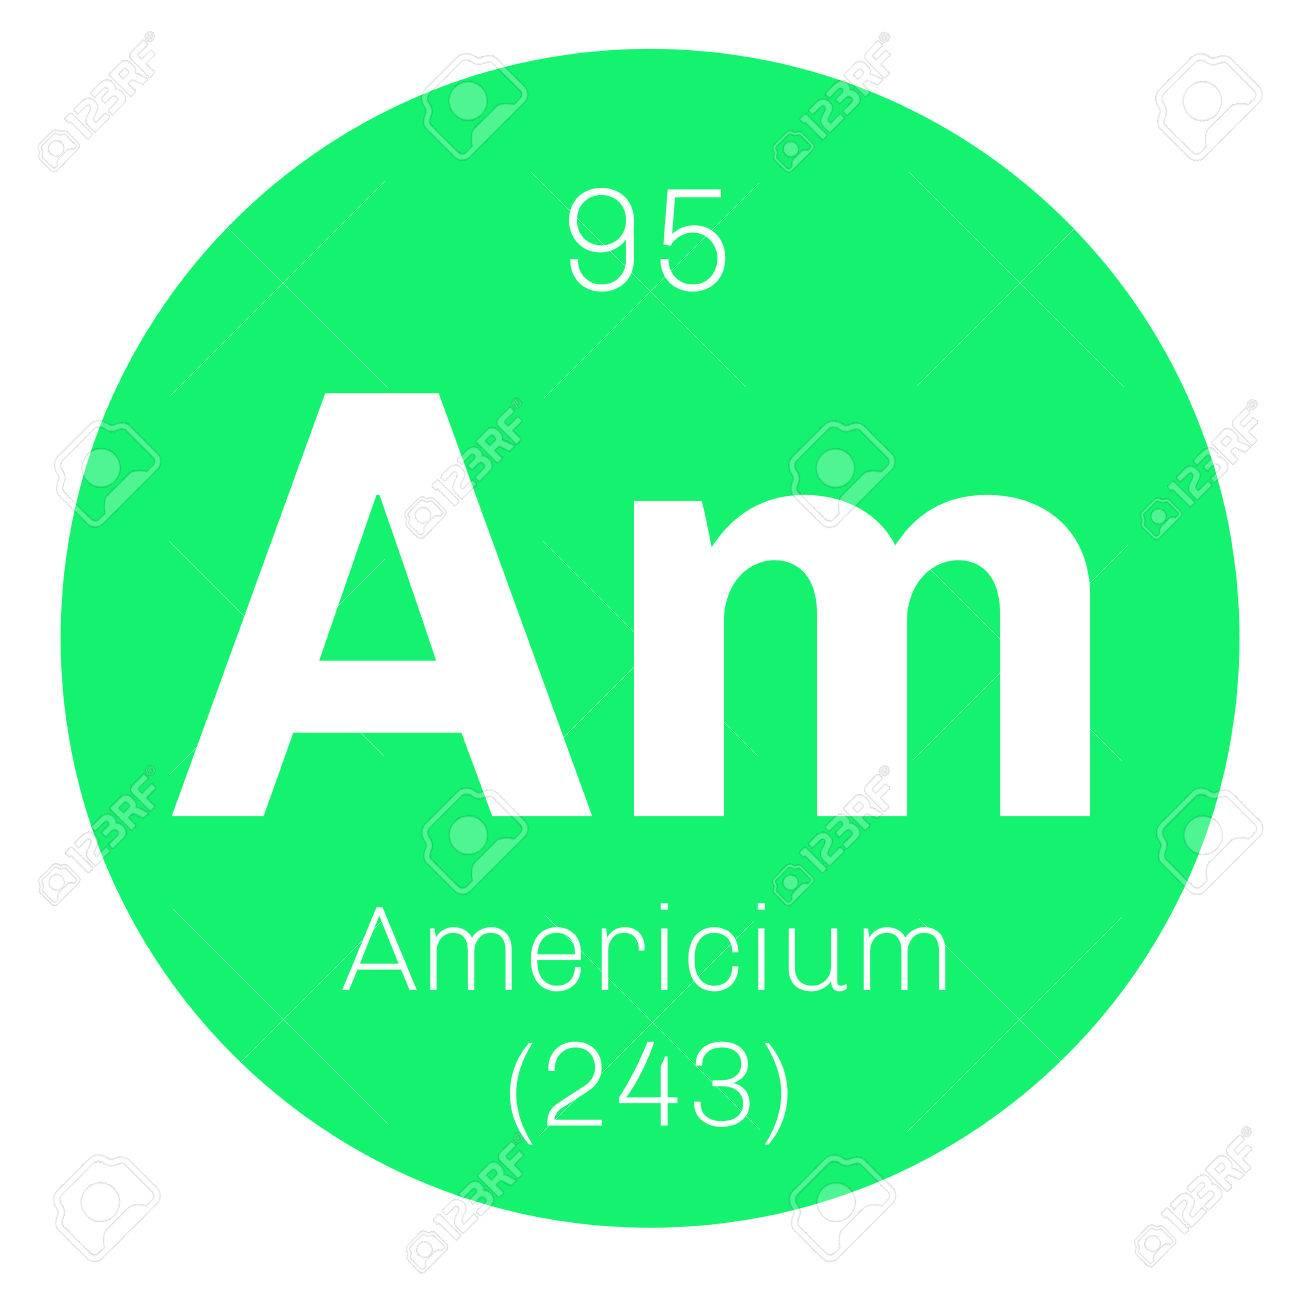 Americium chemical element radioactive transuranic chemical americium chemical element radioactive transuranic chemical element colored icon with atomic number and atomic urtaz Choice Image